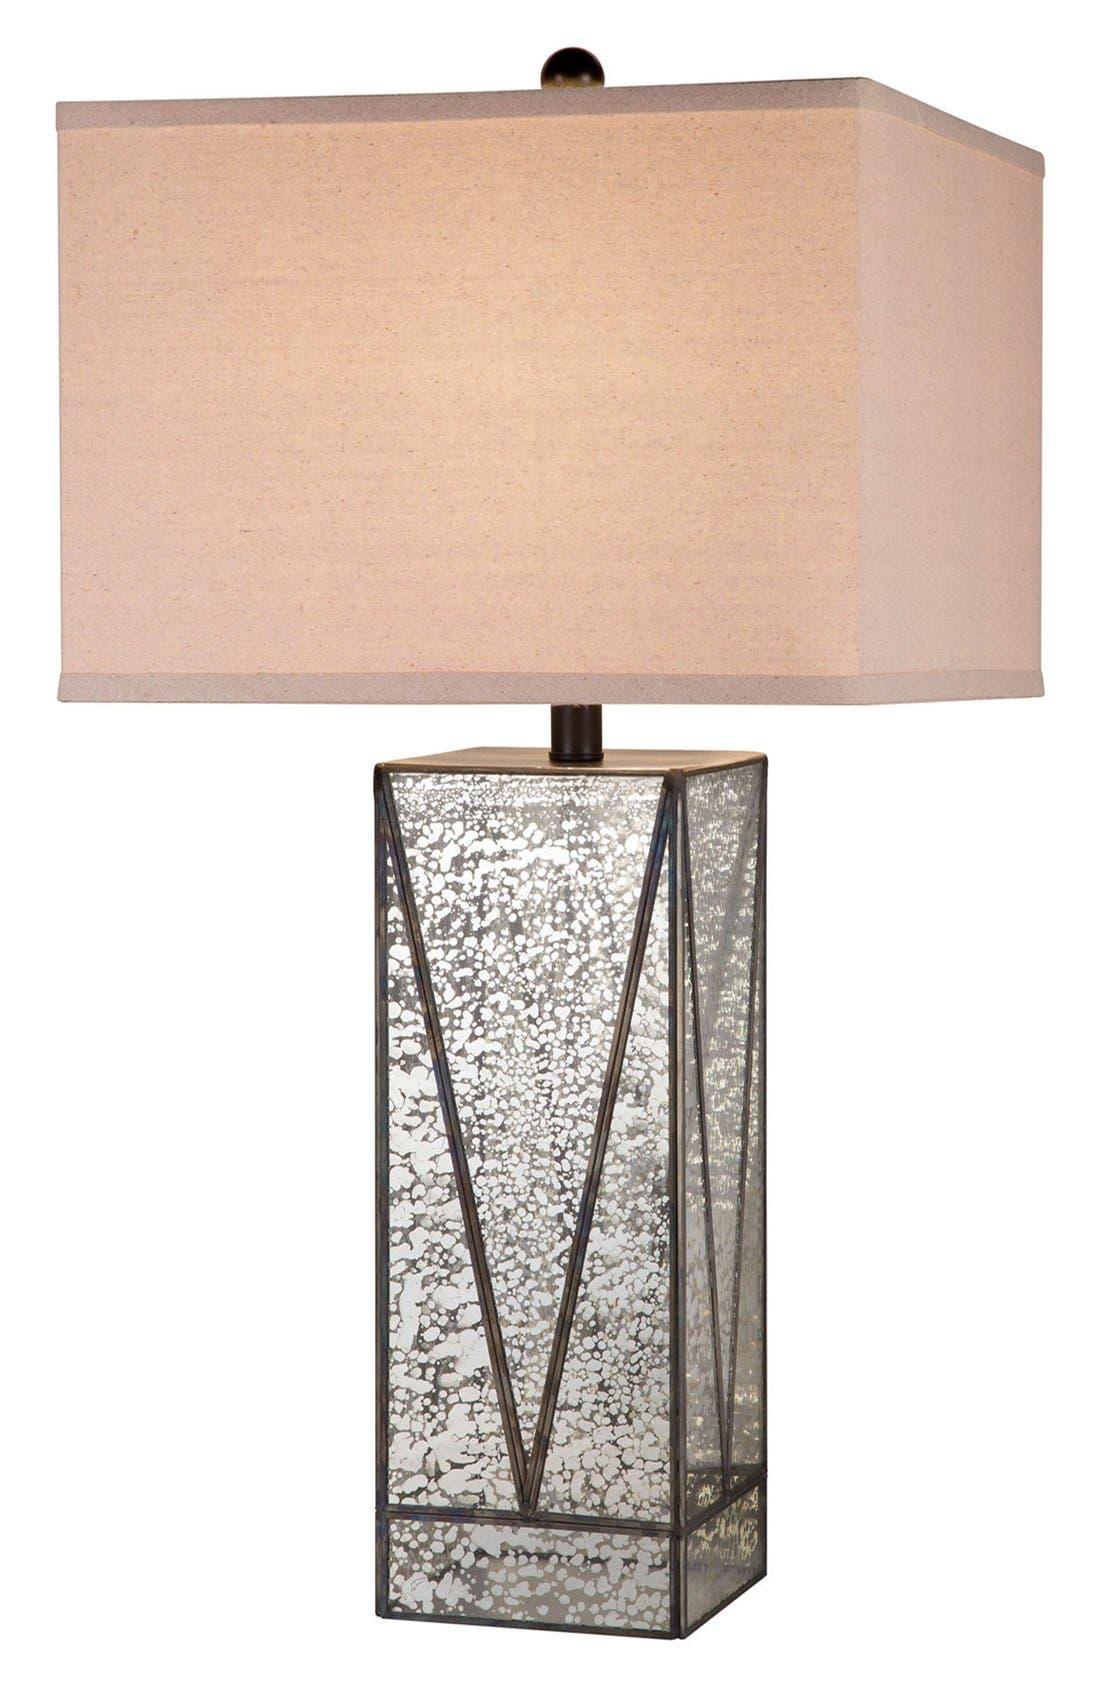 Alternate Image 1 Selected - JAlexander Mercury Glass Table Lamp